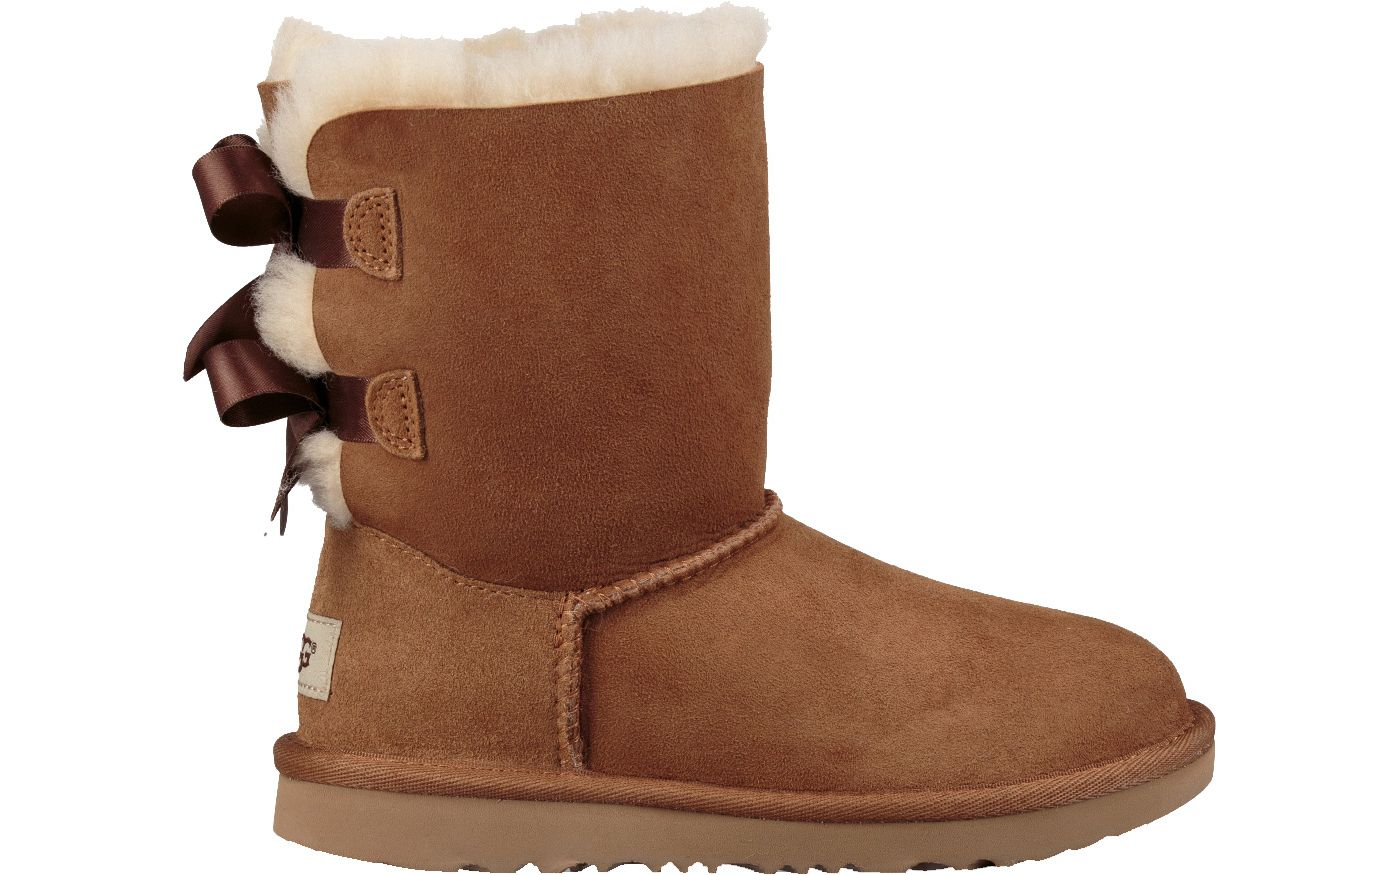 UGG Kid's Bailey Bow II Sheepskin Boots